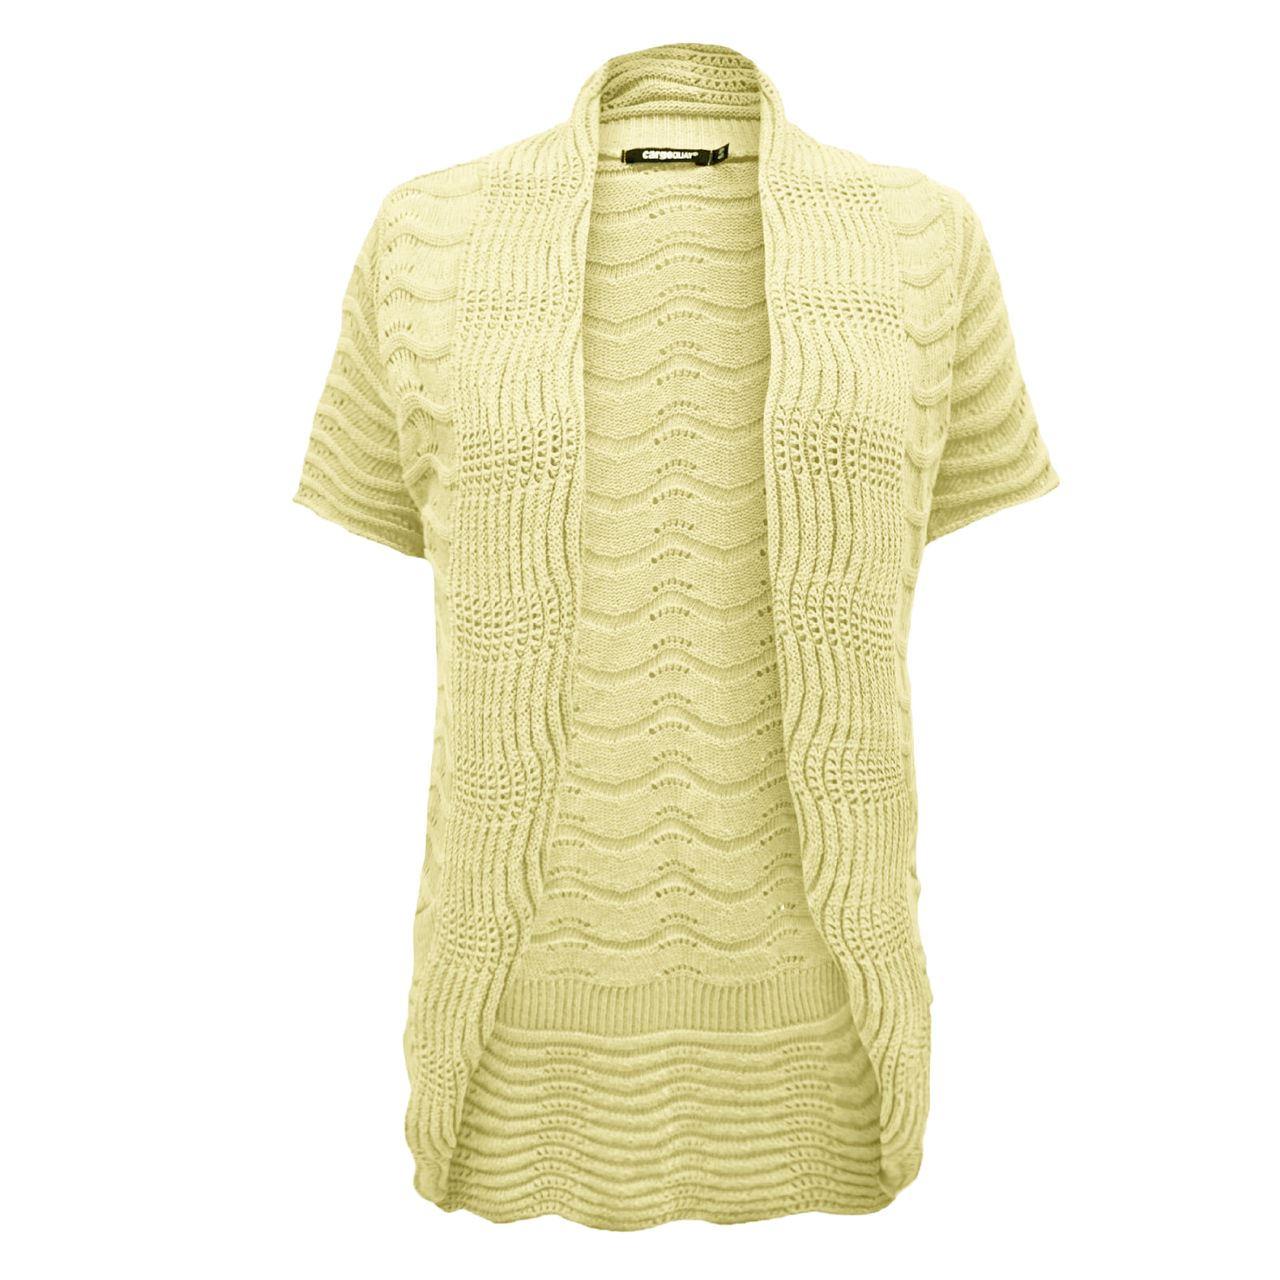 Knitting Pattern Ladies Short Sleeve Cardigan : NEW Ladies Womens Knitted Long Bolero Shrug Cardigan Short Sleeve Dress TOP 8...